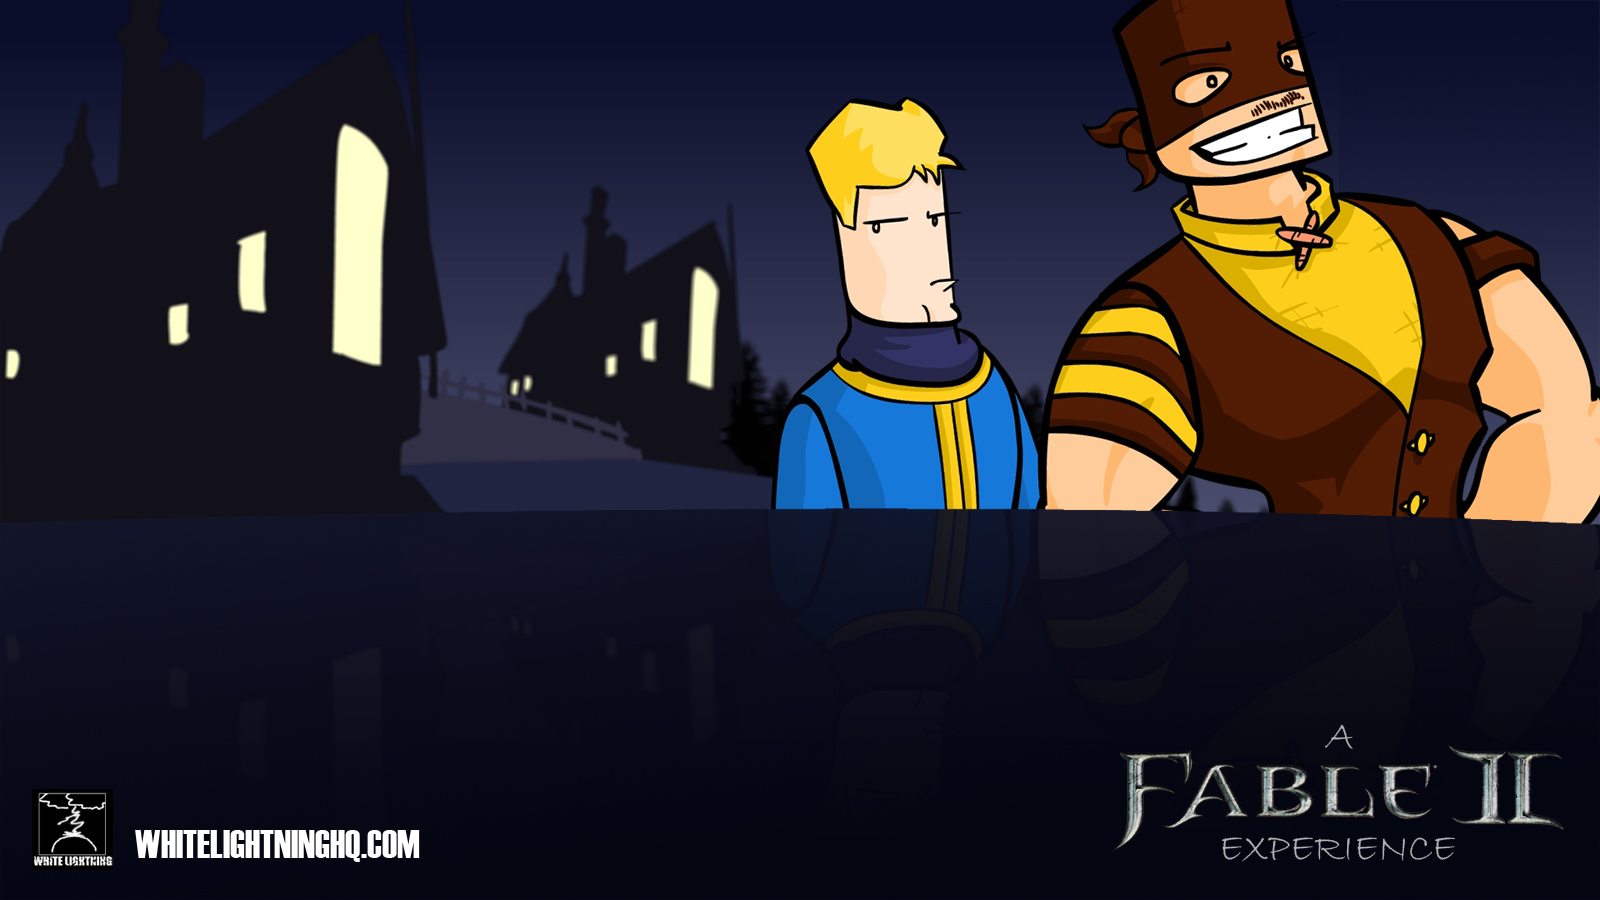 Fable II Xbox Dashboard BG by WhiteLightning on Newgrounds